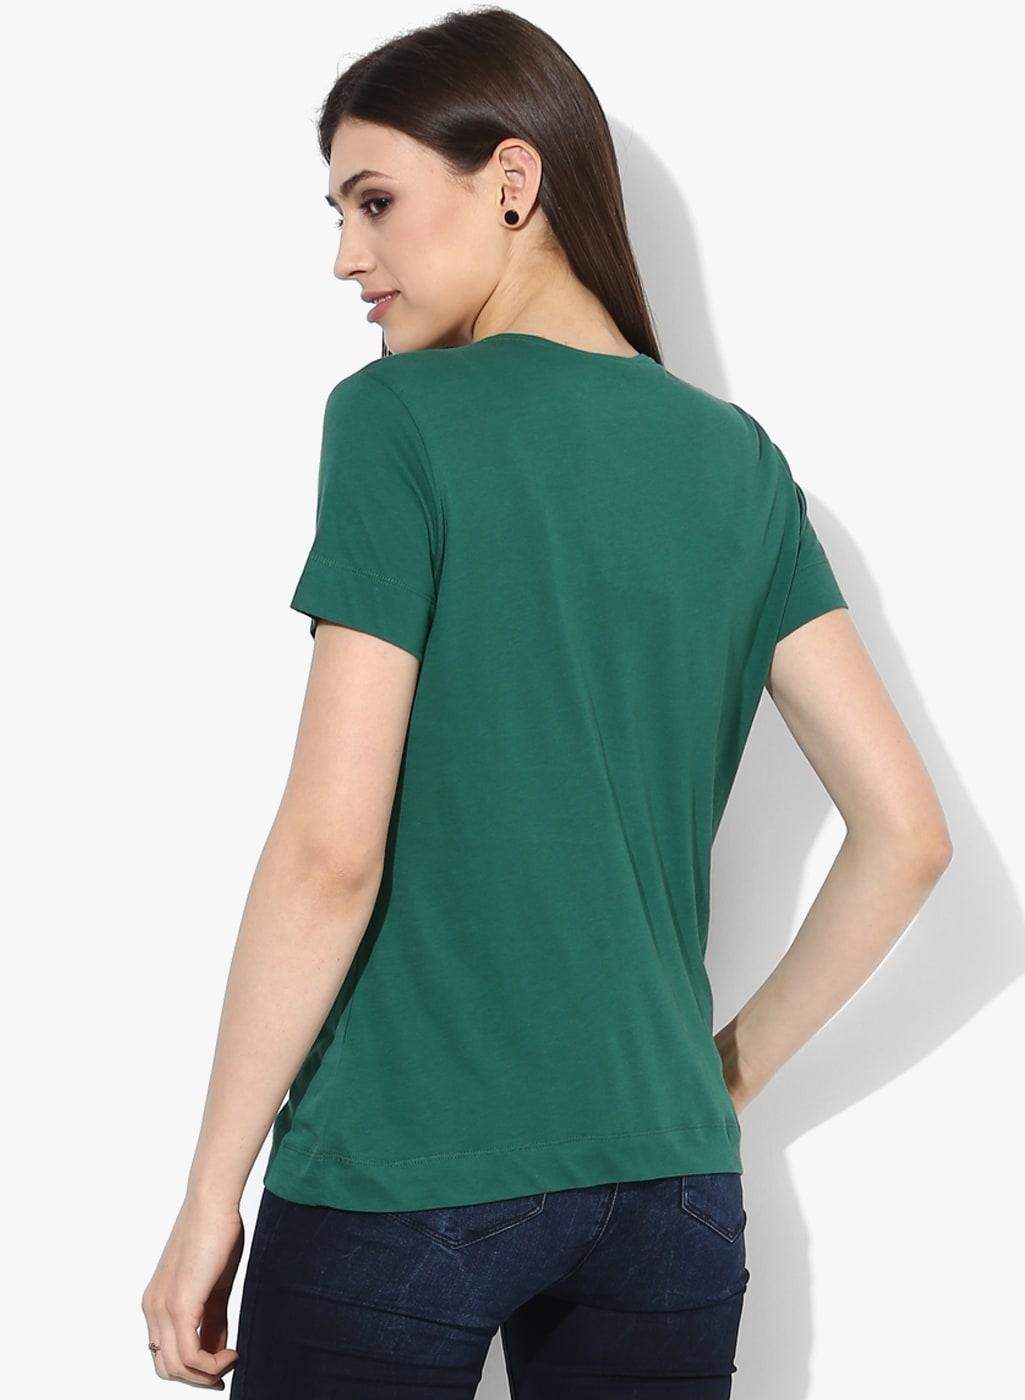 c7d04fdfc41 Women Apparel Tops Tees Shirts - Buy Women Apparel Tops Tees Shirts online  in India - Jabong